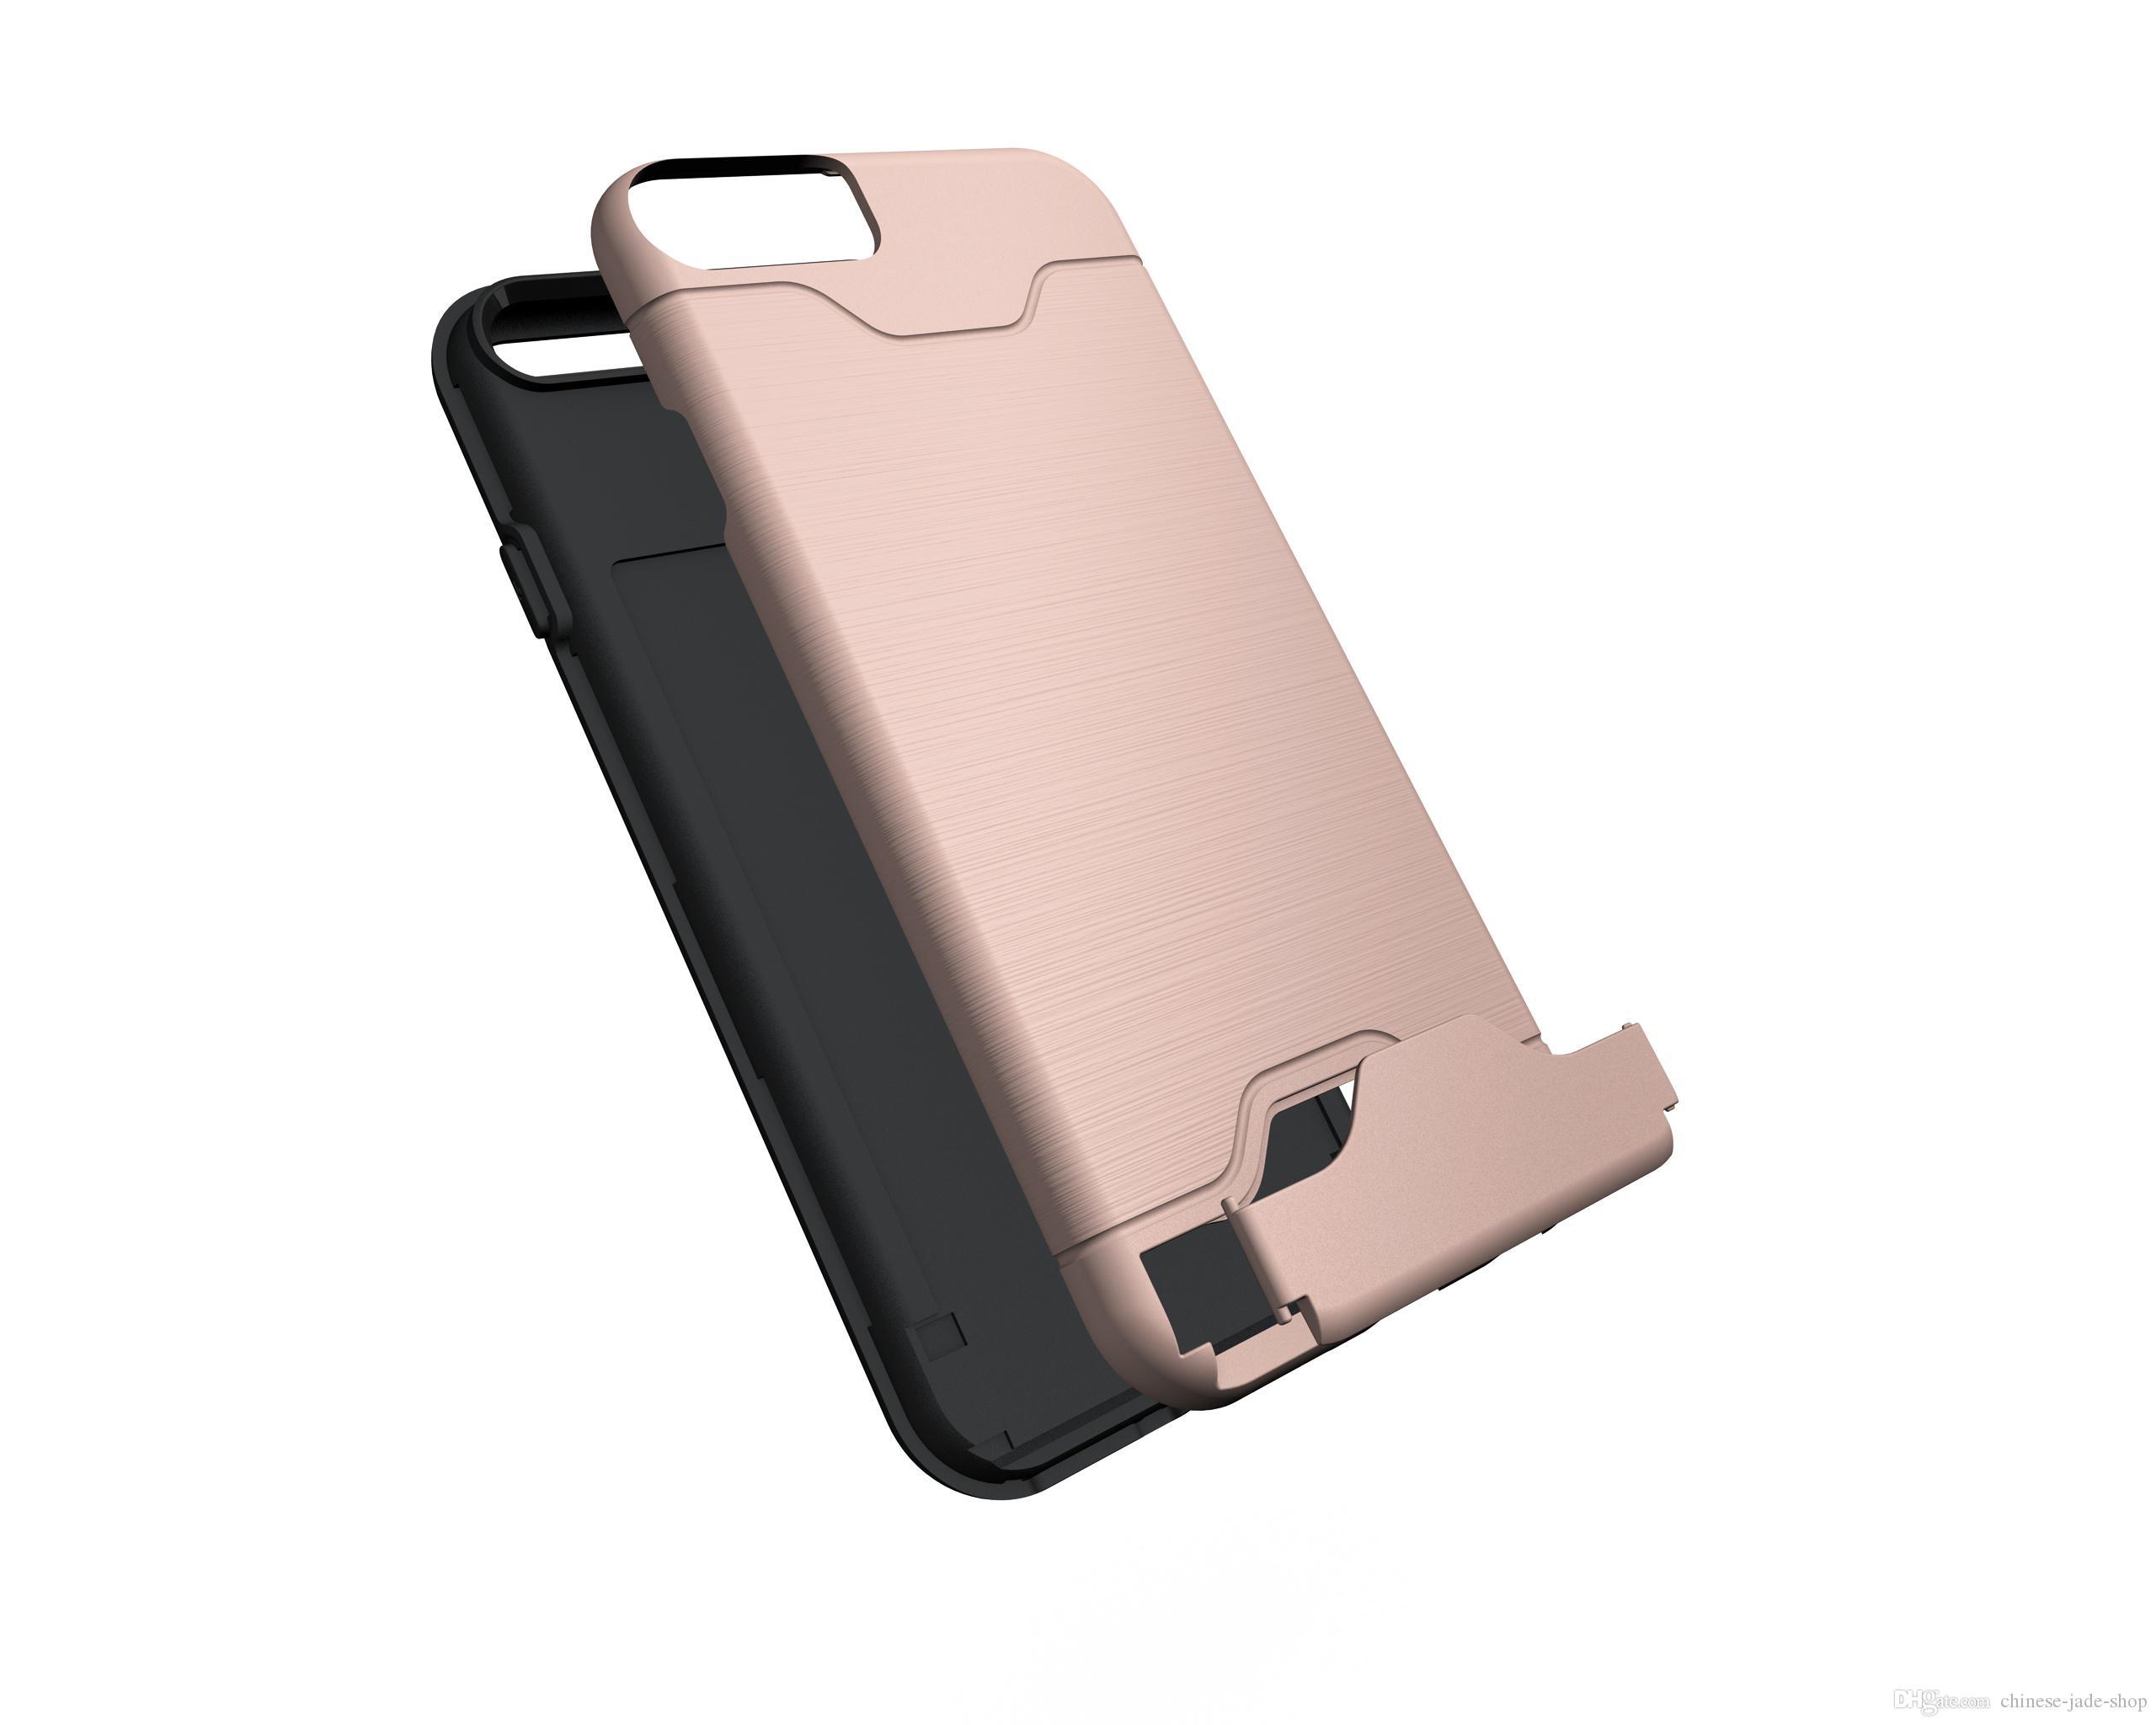 Hybrid Armor Geborsteld Houder Creditcard Pocket Cover Case Kickstand voor iPhone 11 PRO 11 PRO MAX 6 7 8 PLUS XR XS XS MAX / PARTIJ